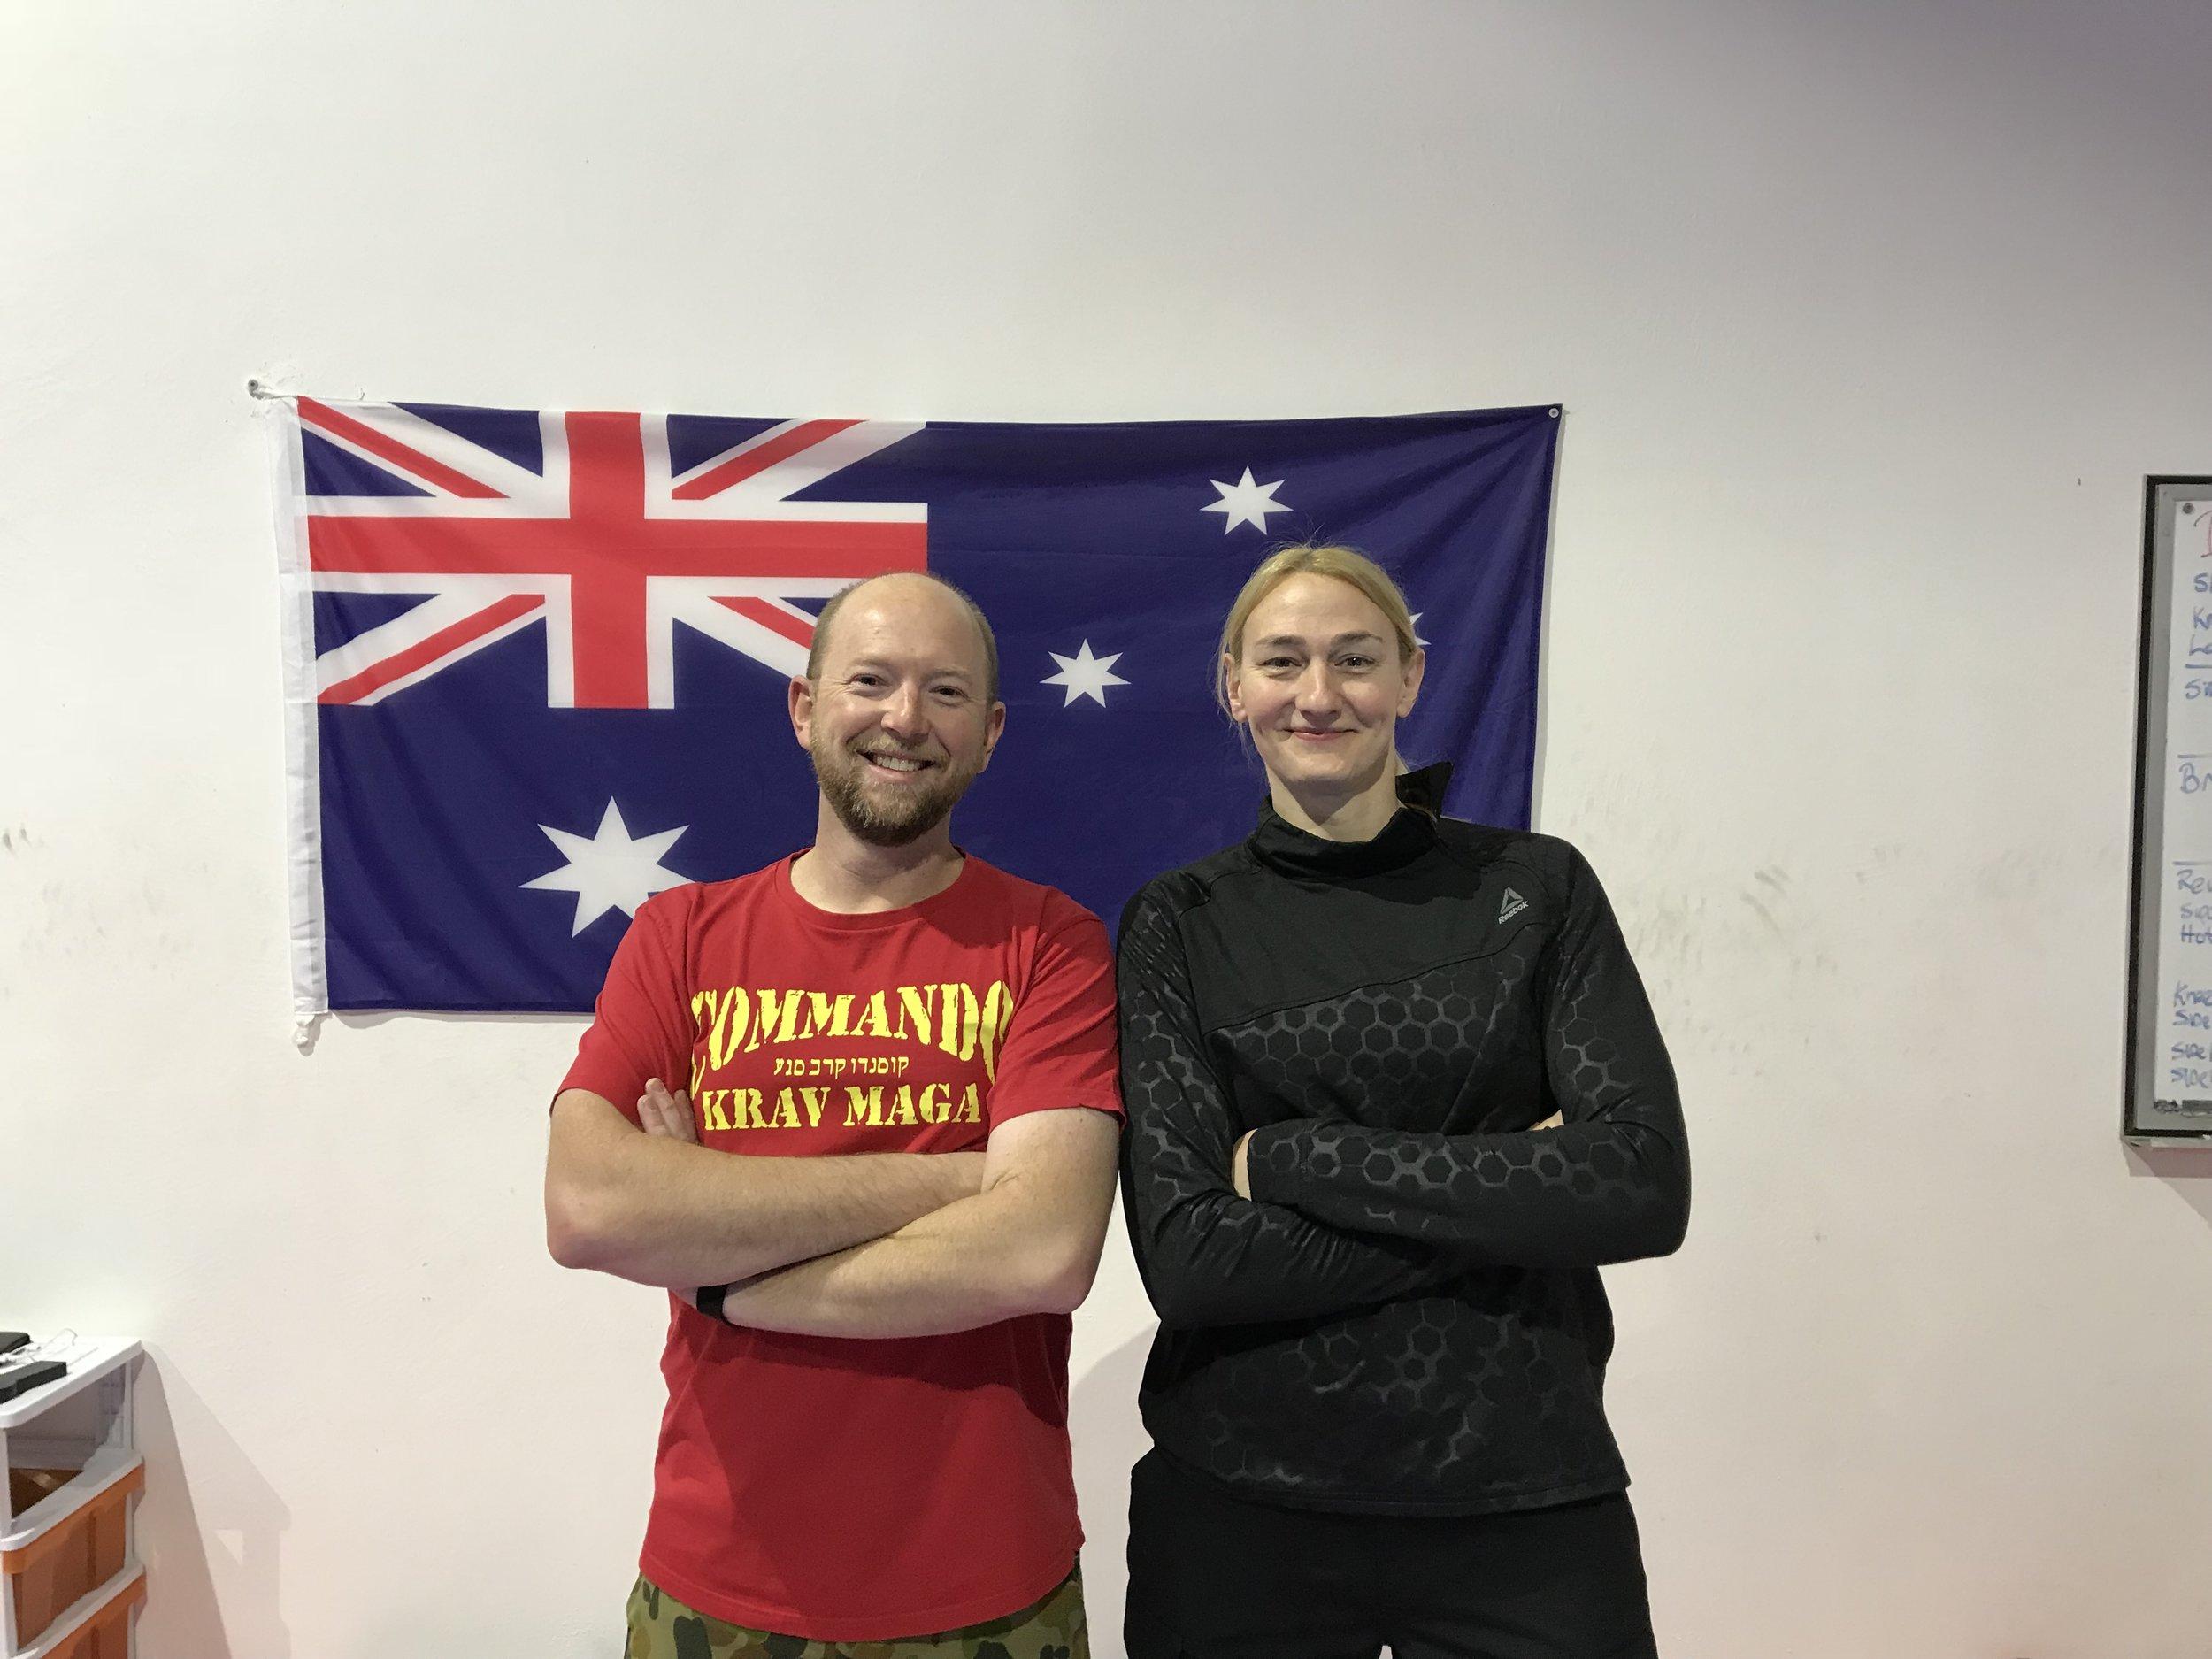 Commando Krav Maga Melbourne